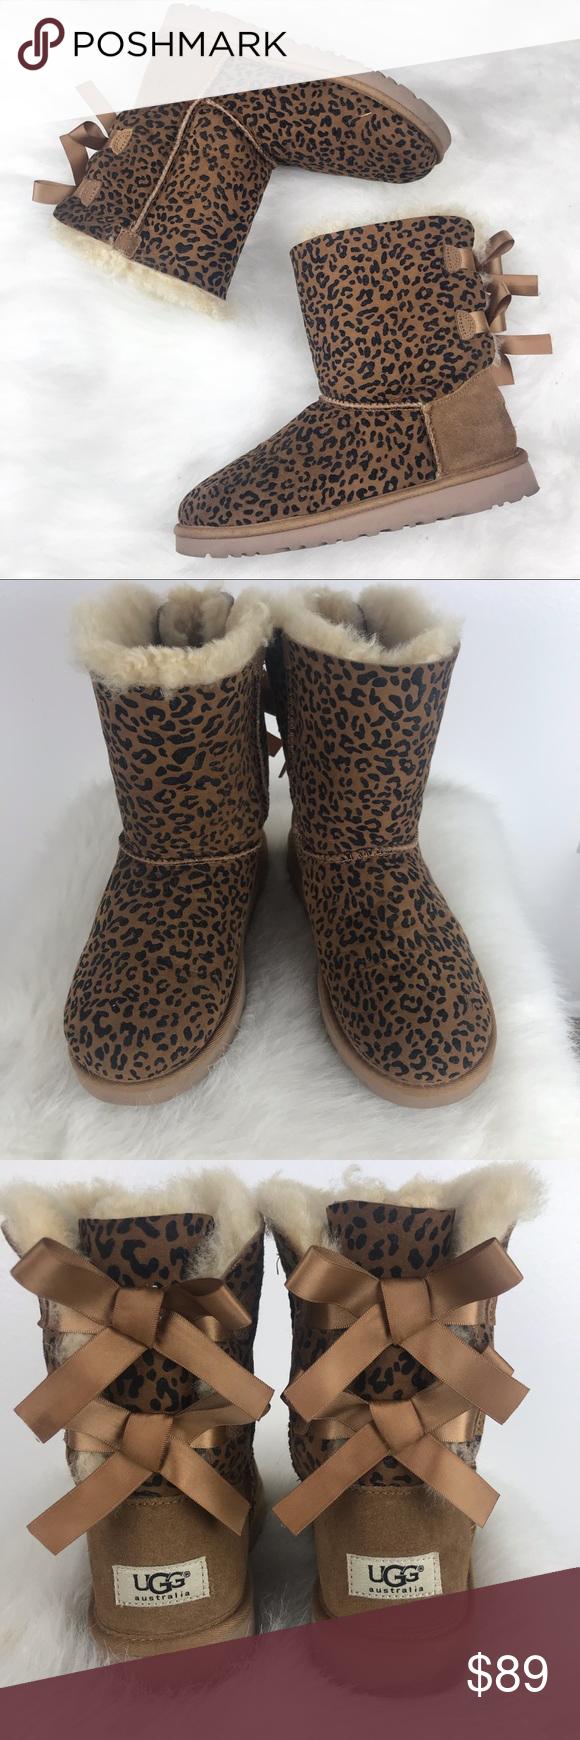 67d666ff599 Cheetah Bailey Bow Uggs Big Kids Size 4 Cheetah Bailey Bow Uggs Big ...